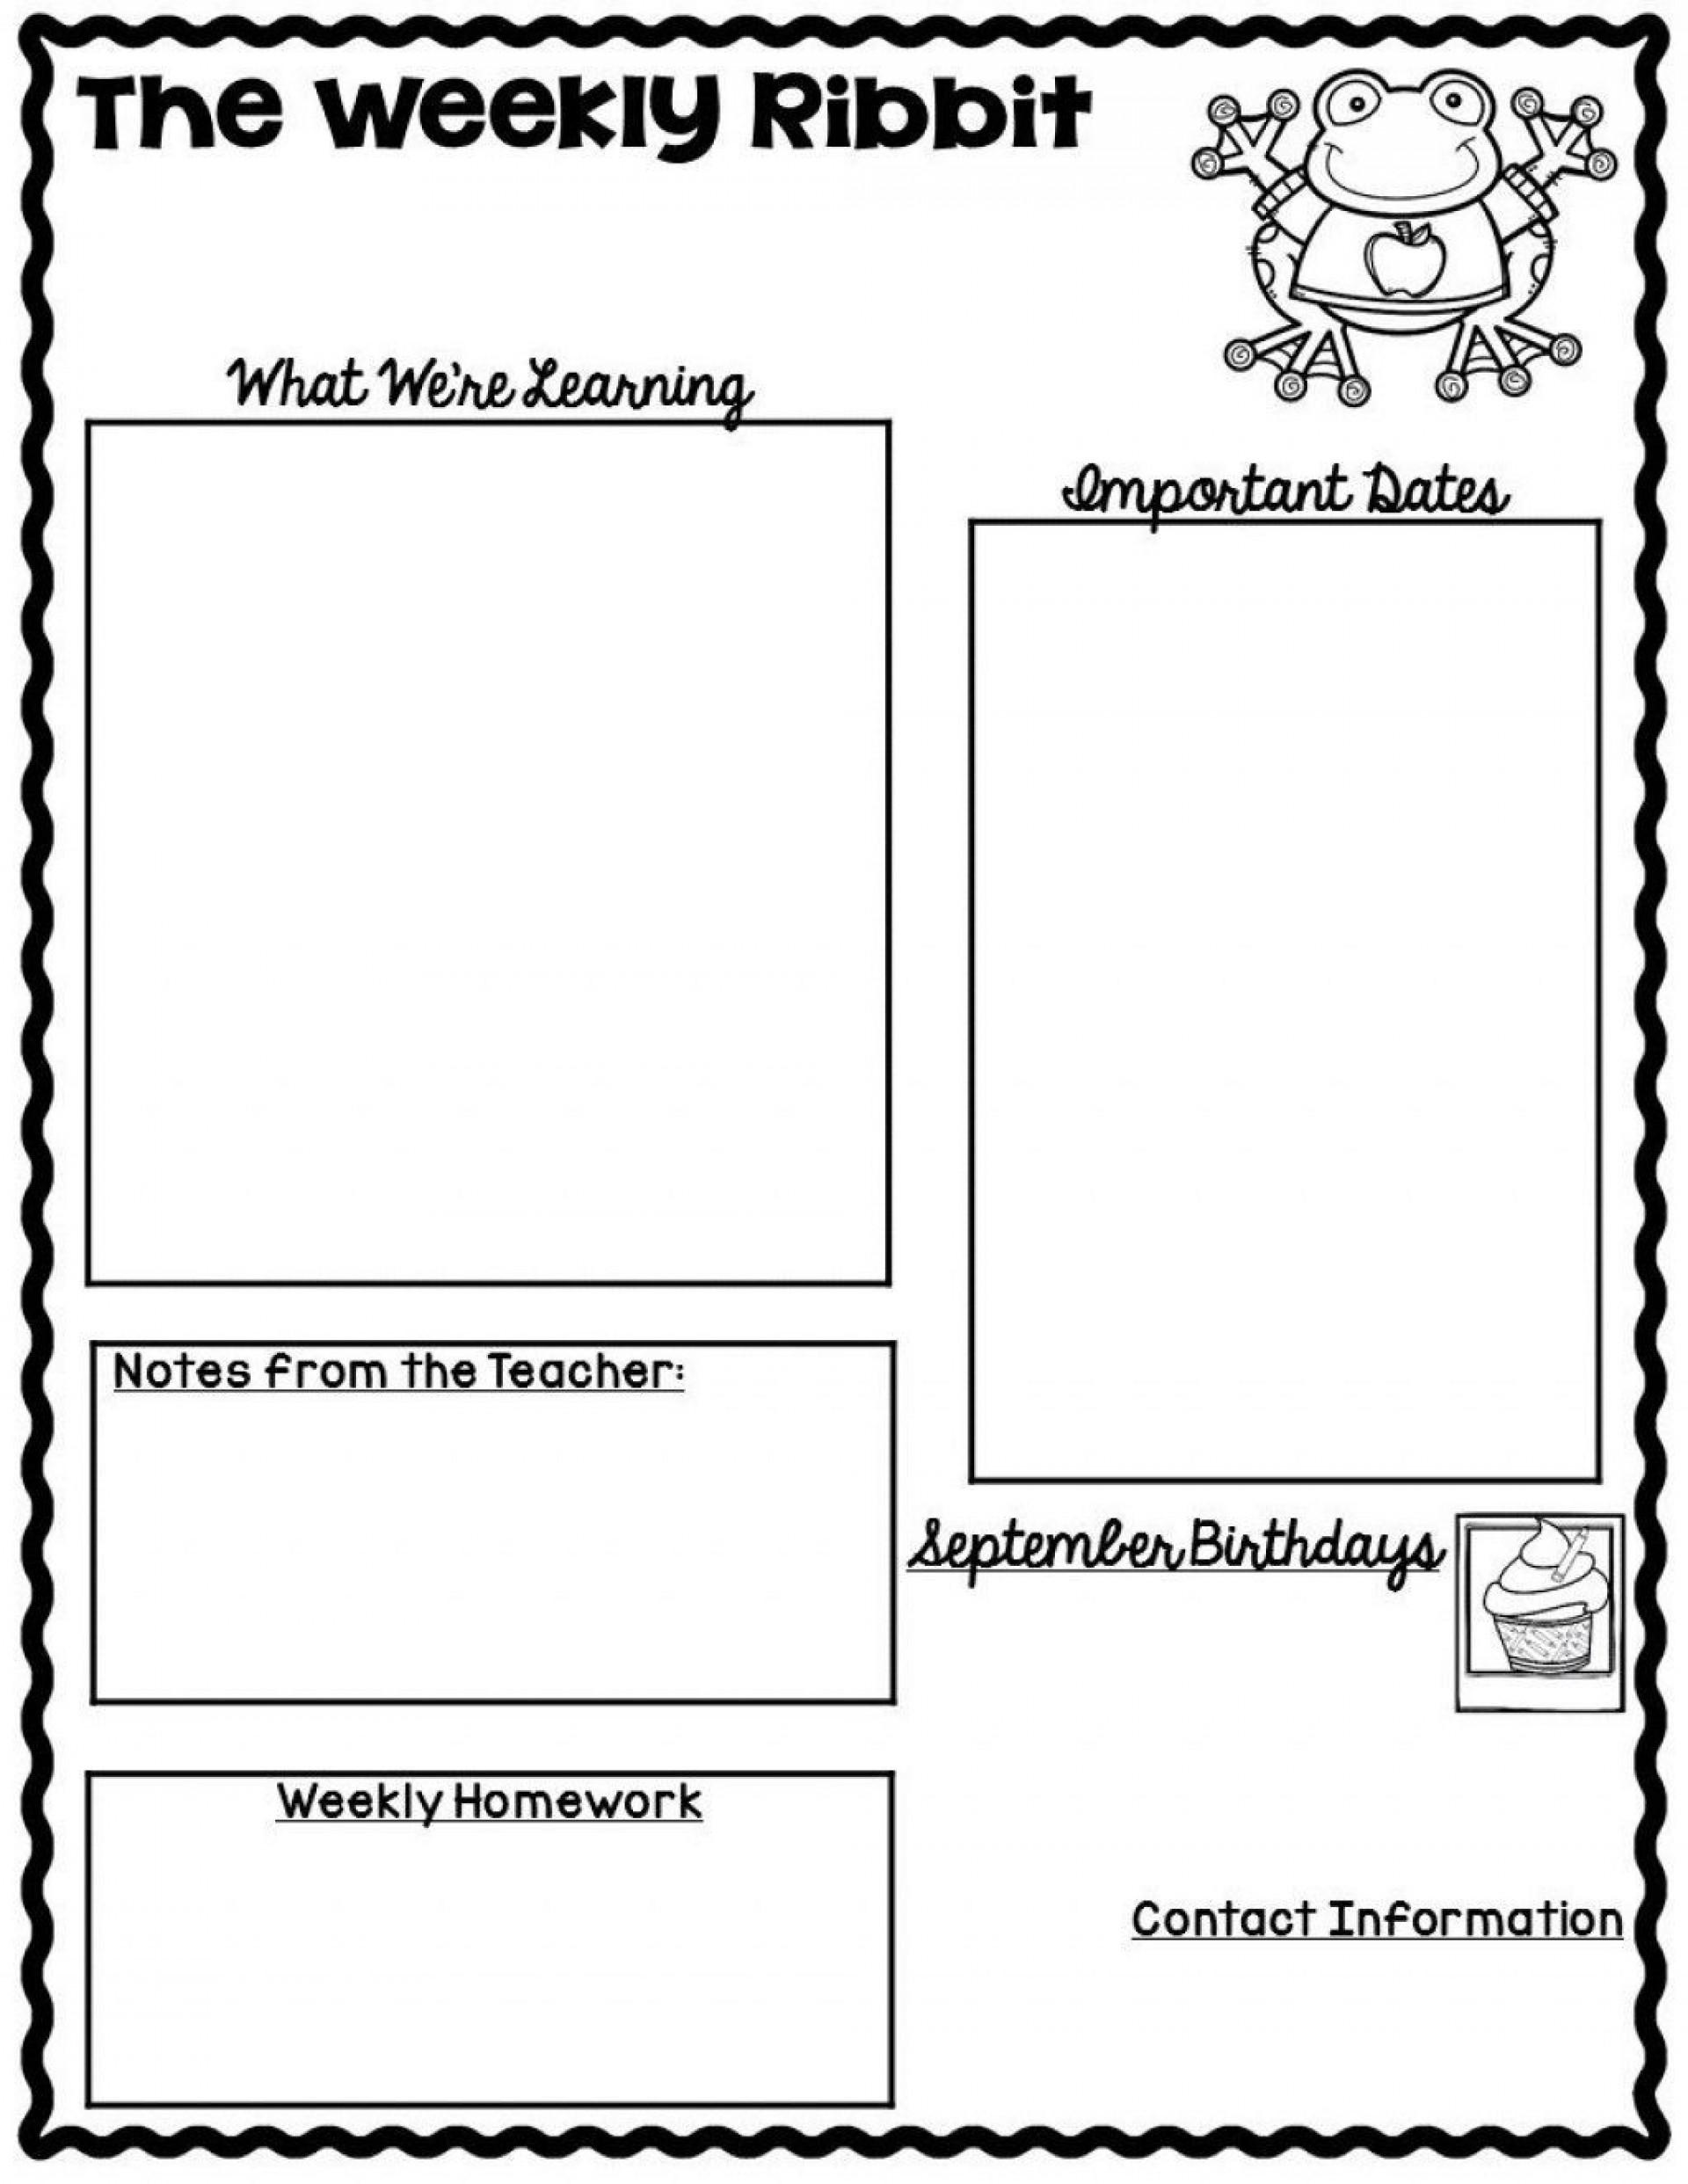 004 Awesome Google Newsletter Template For Teacher Image  Teachers Free1920